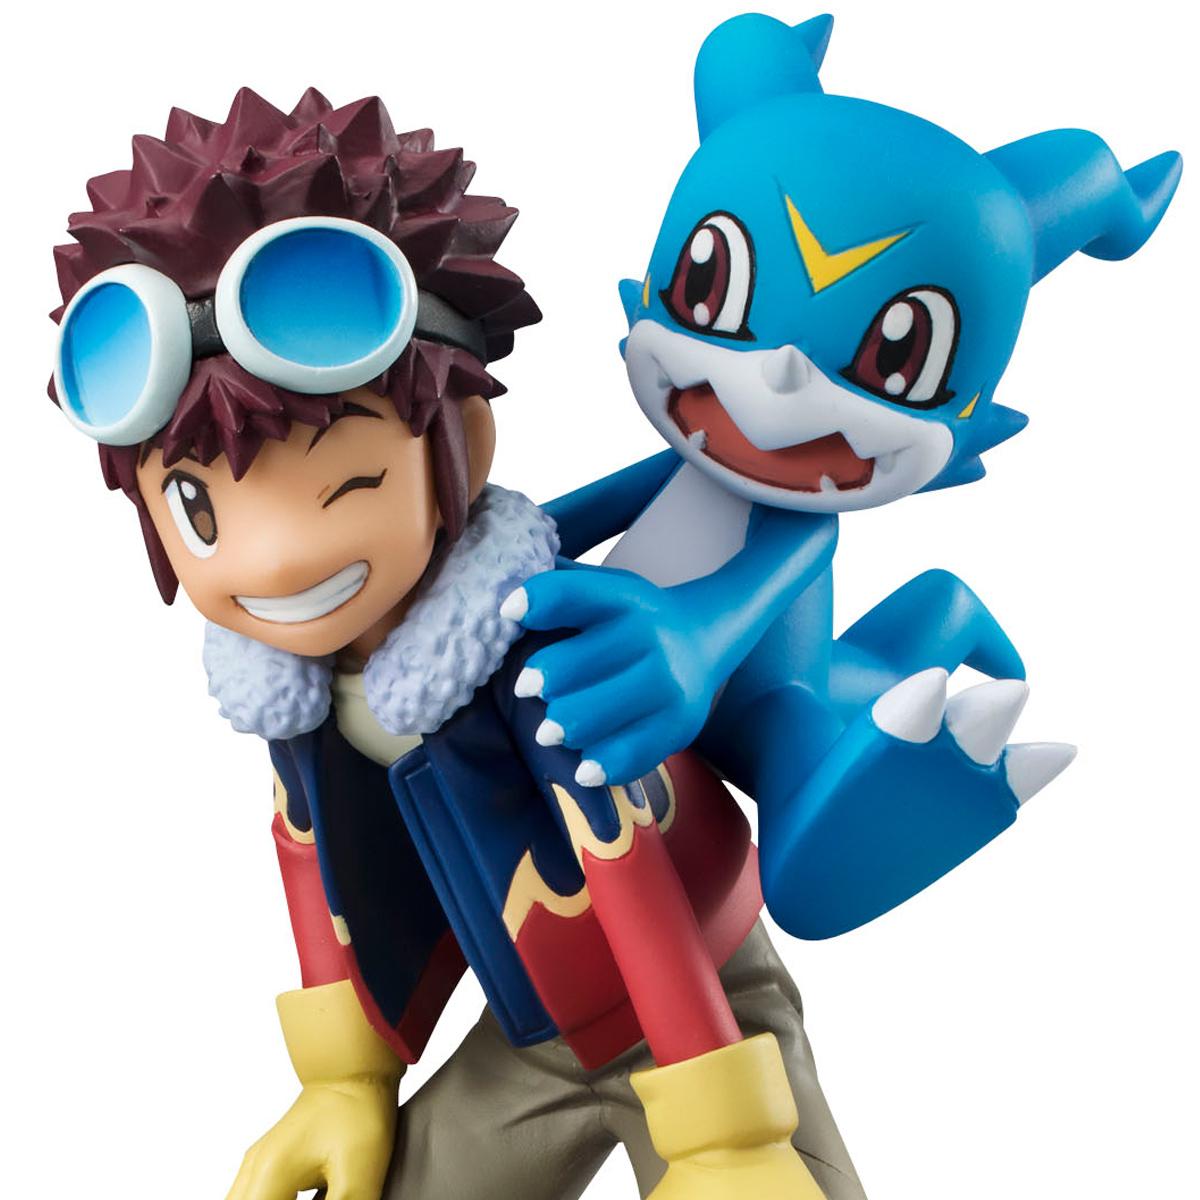 Digimon Adventure 02 - Motomiya Daisuke - Veemon - G.E.M. (Limited Pre-order)